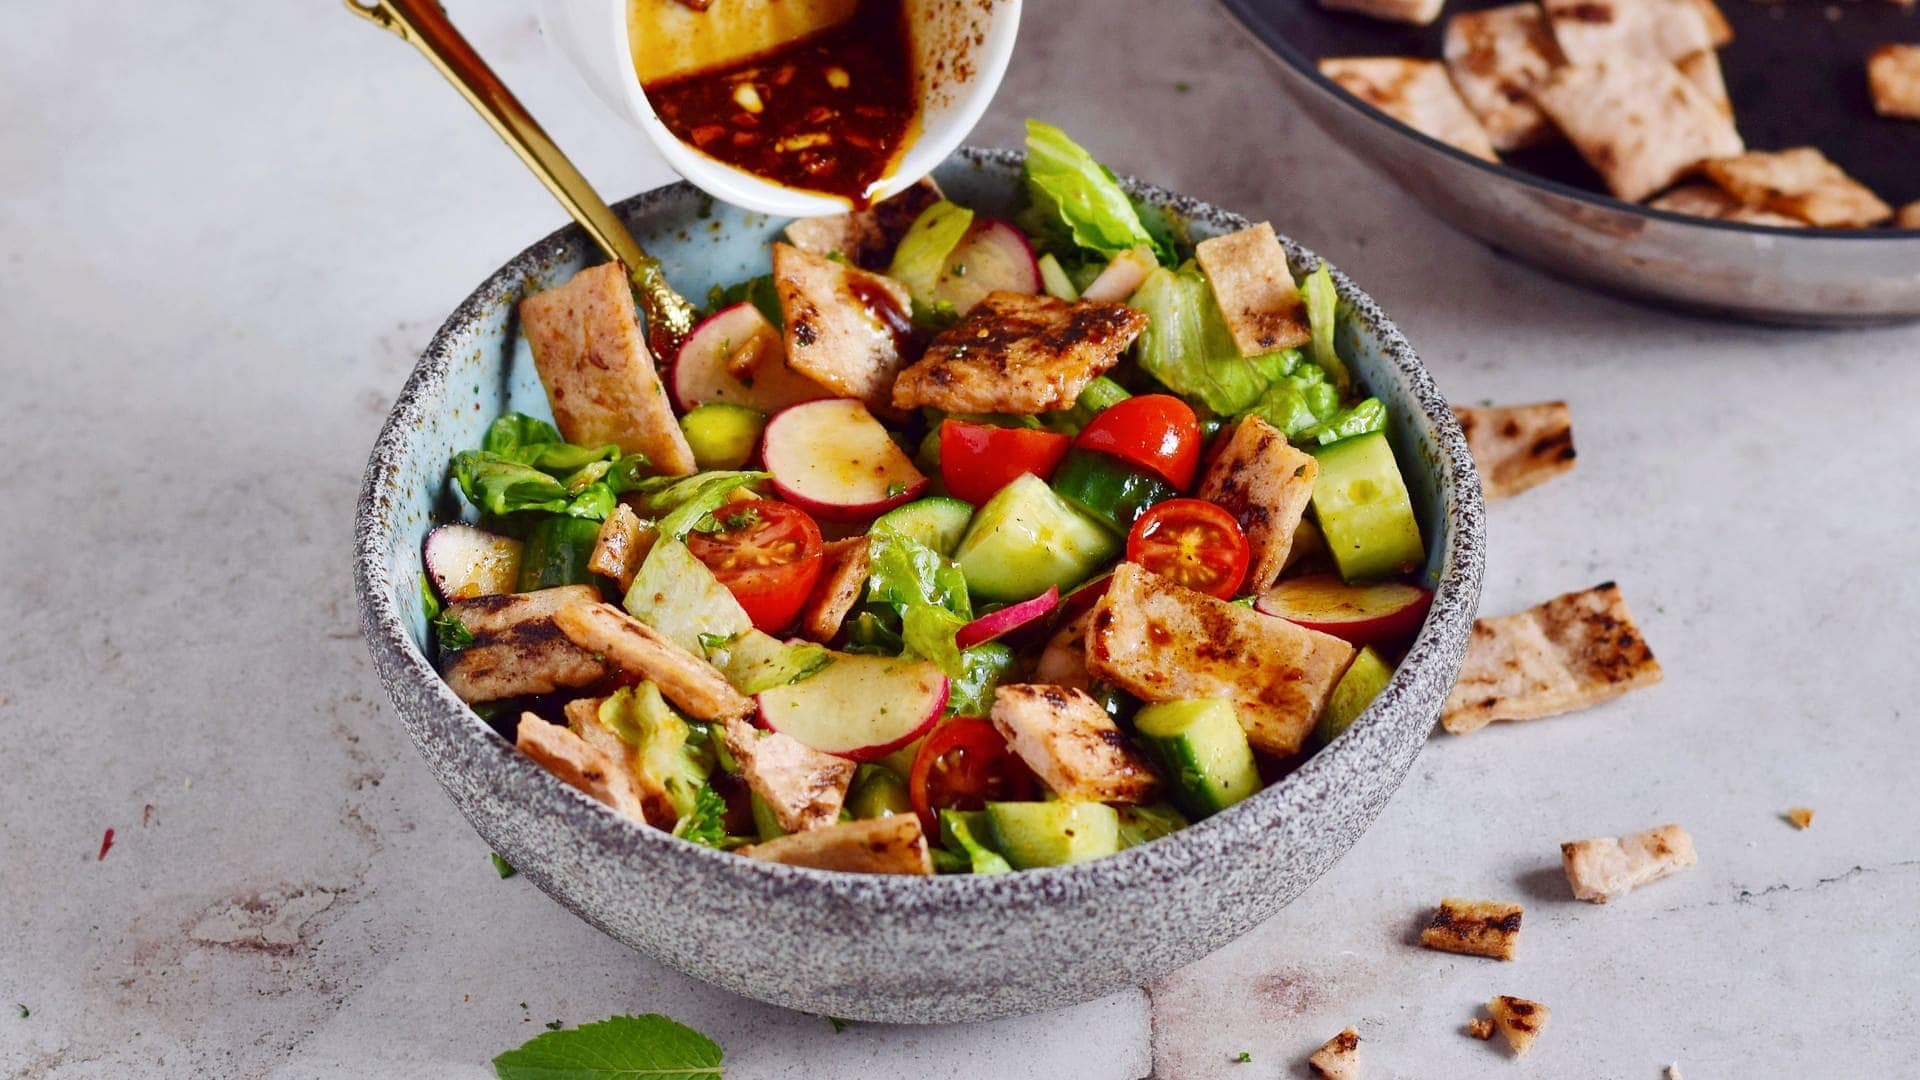 Queraufnahme von Fattoush-Salat